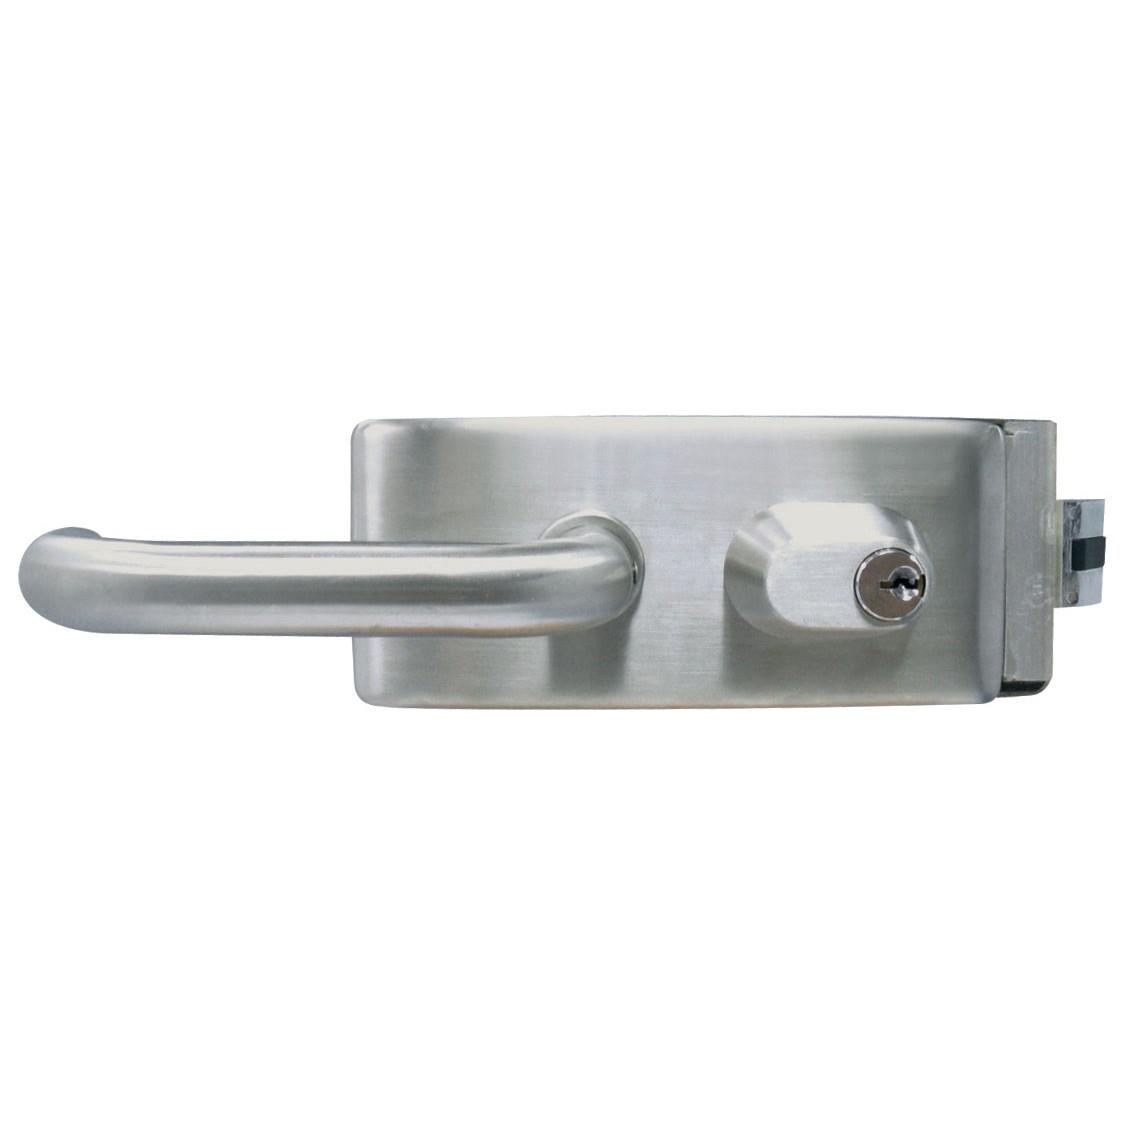 Ahi Hardware Montreal Door Hardware Products European With